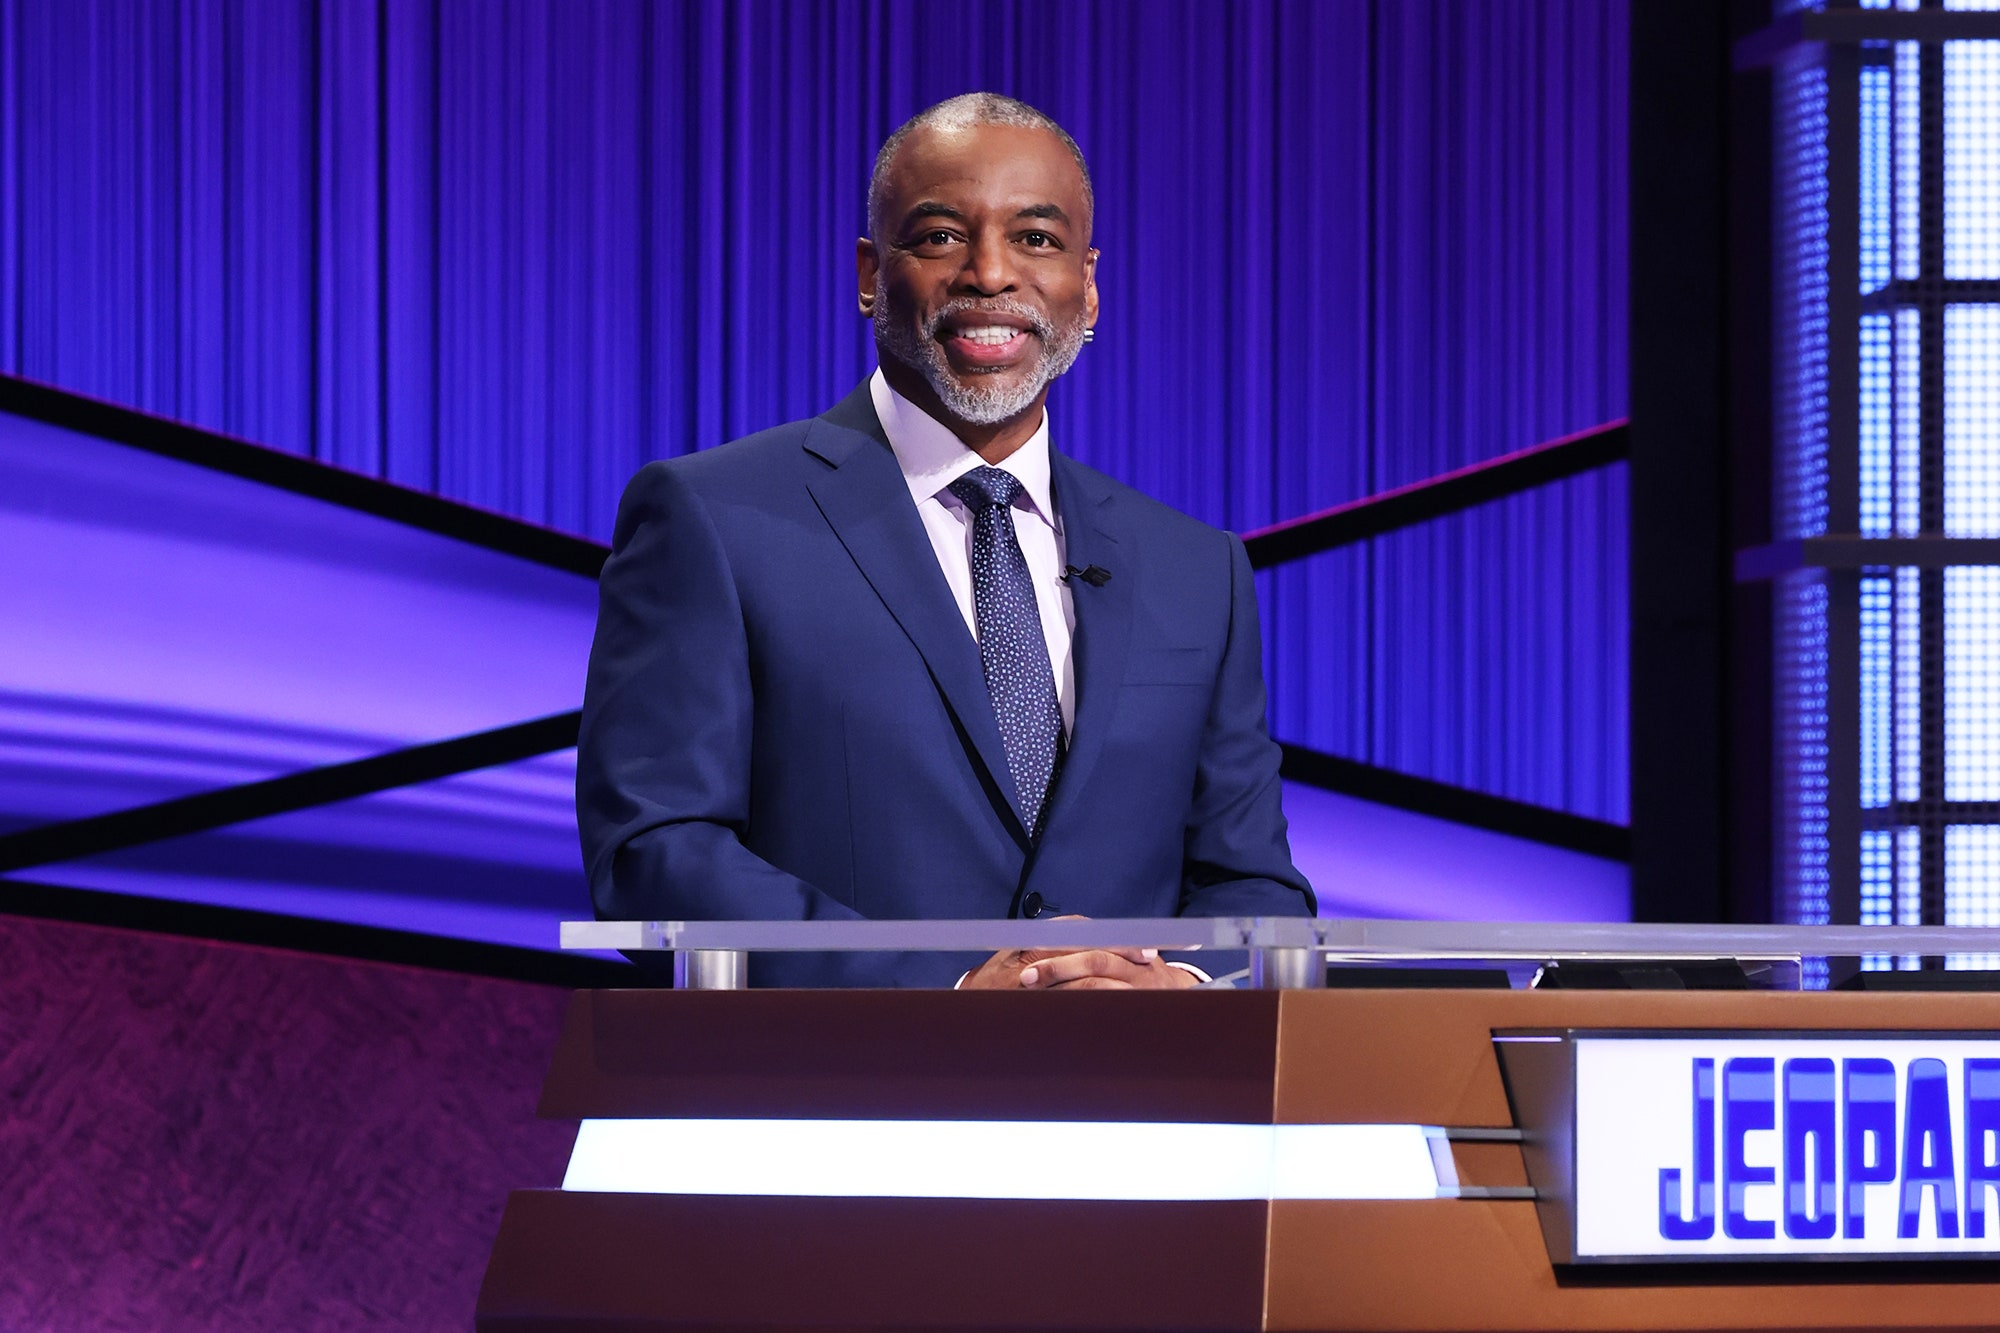 LeVar Burton hosting Jeopardy